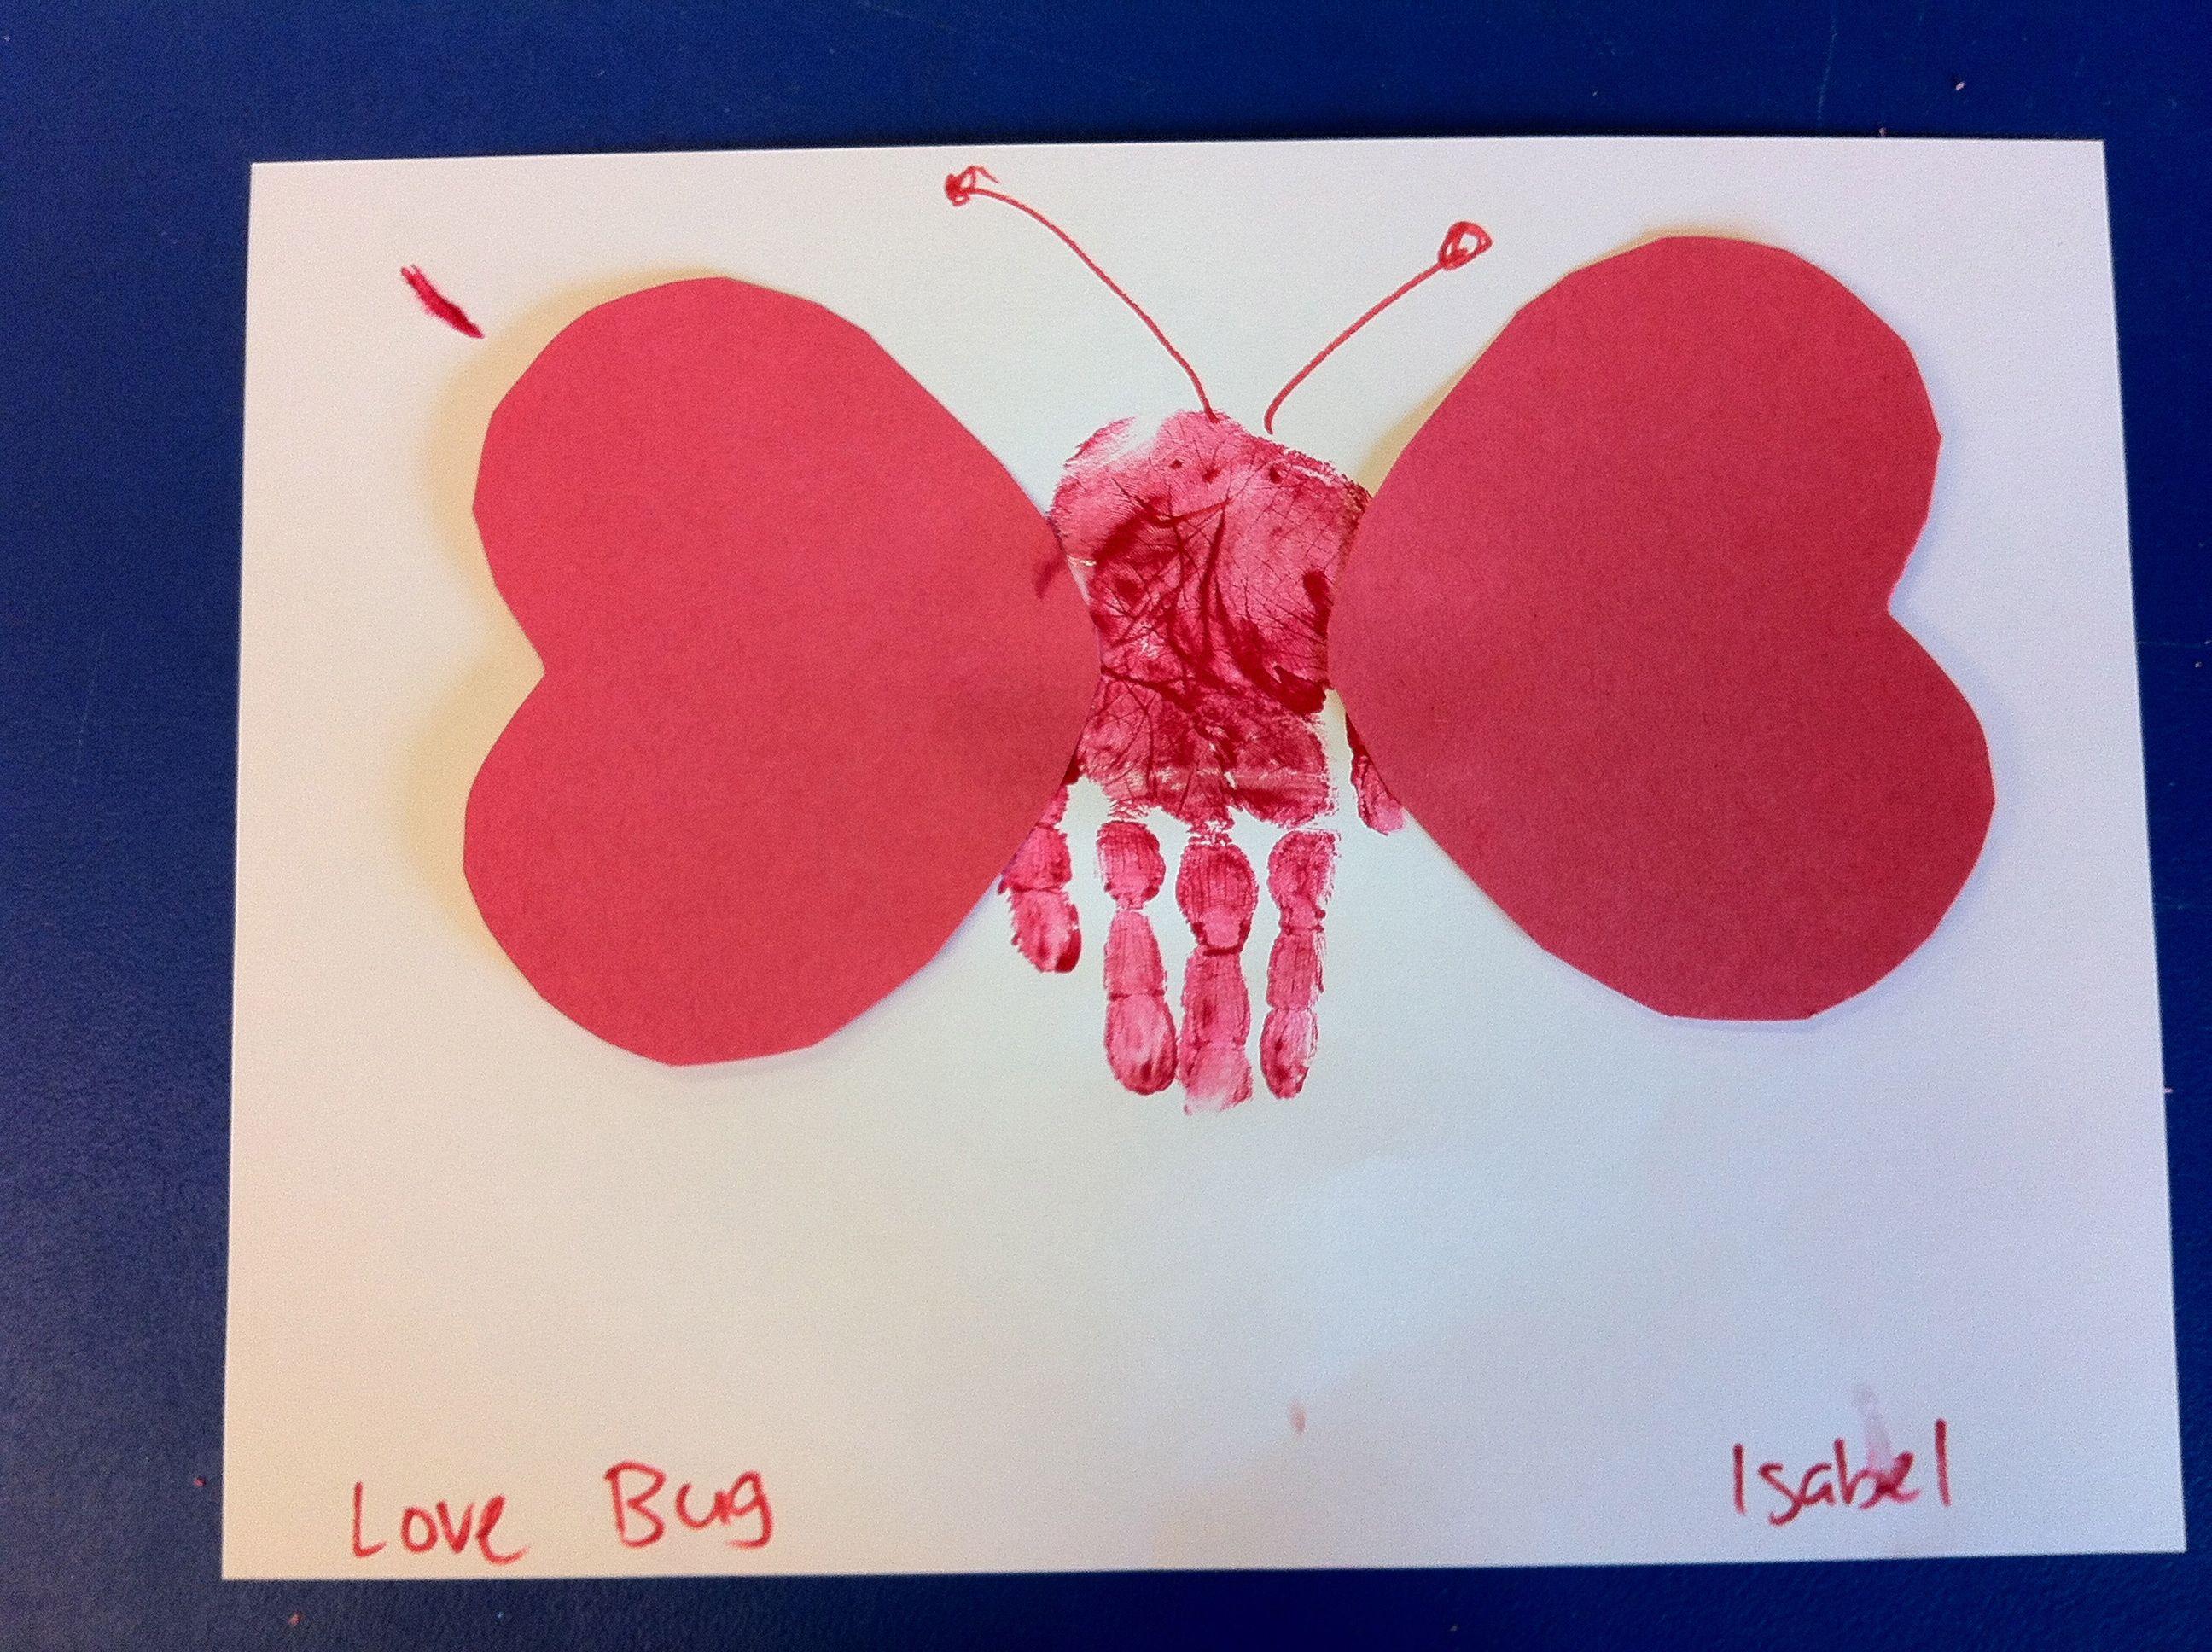 Valentine love bug kindergarten craftspreschool craftscrafts for kidspreschool